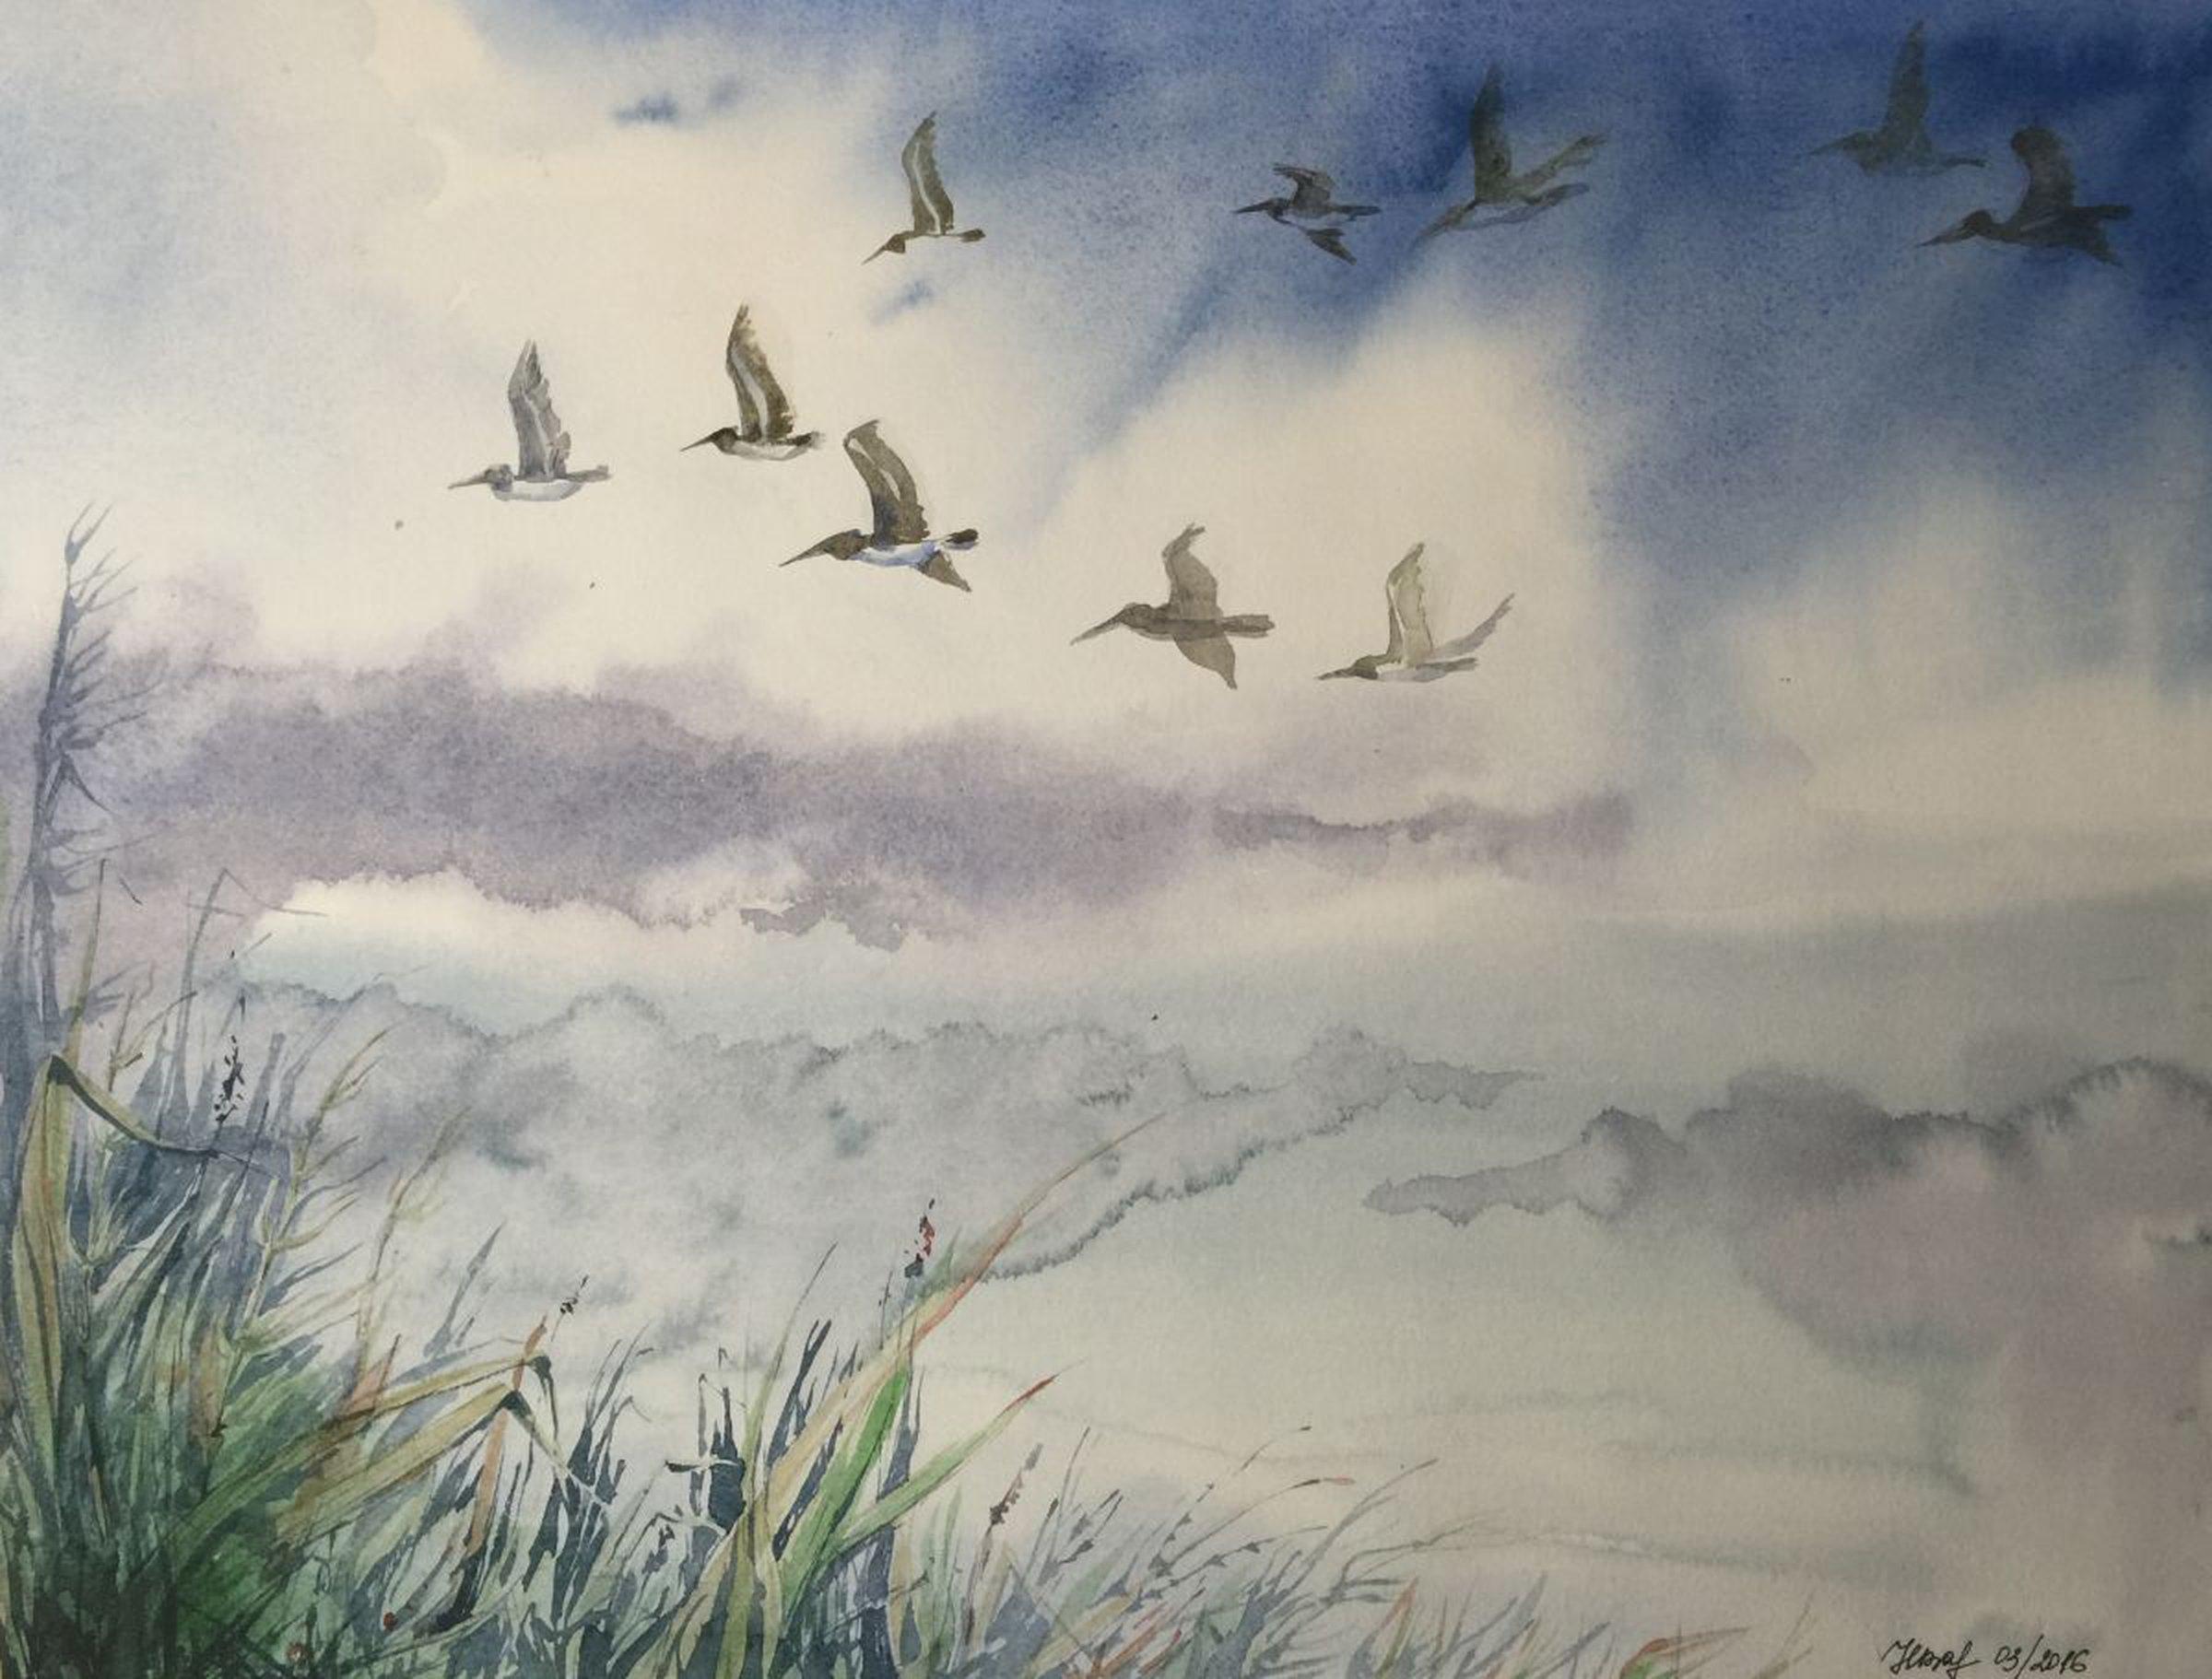 Birds flying in cloudy sky, watercolor painting | Artfinder